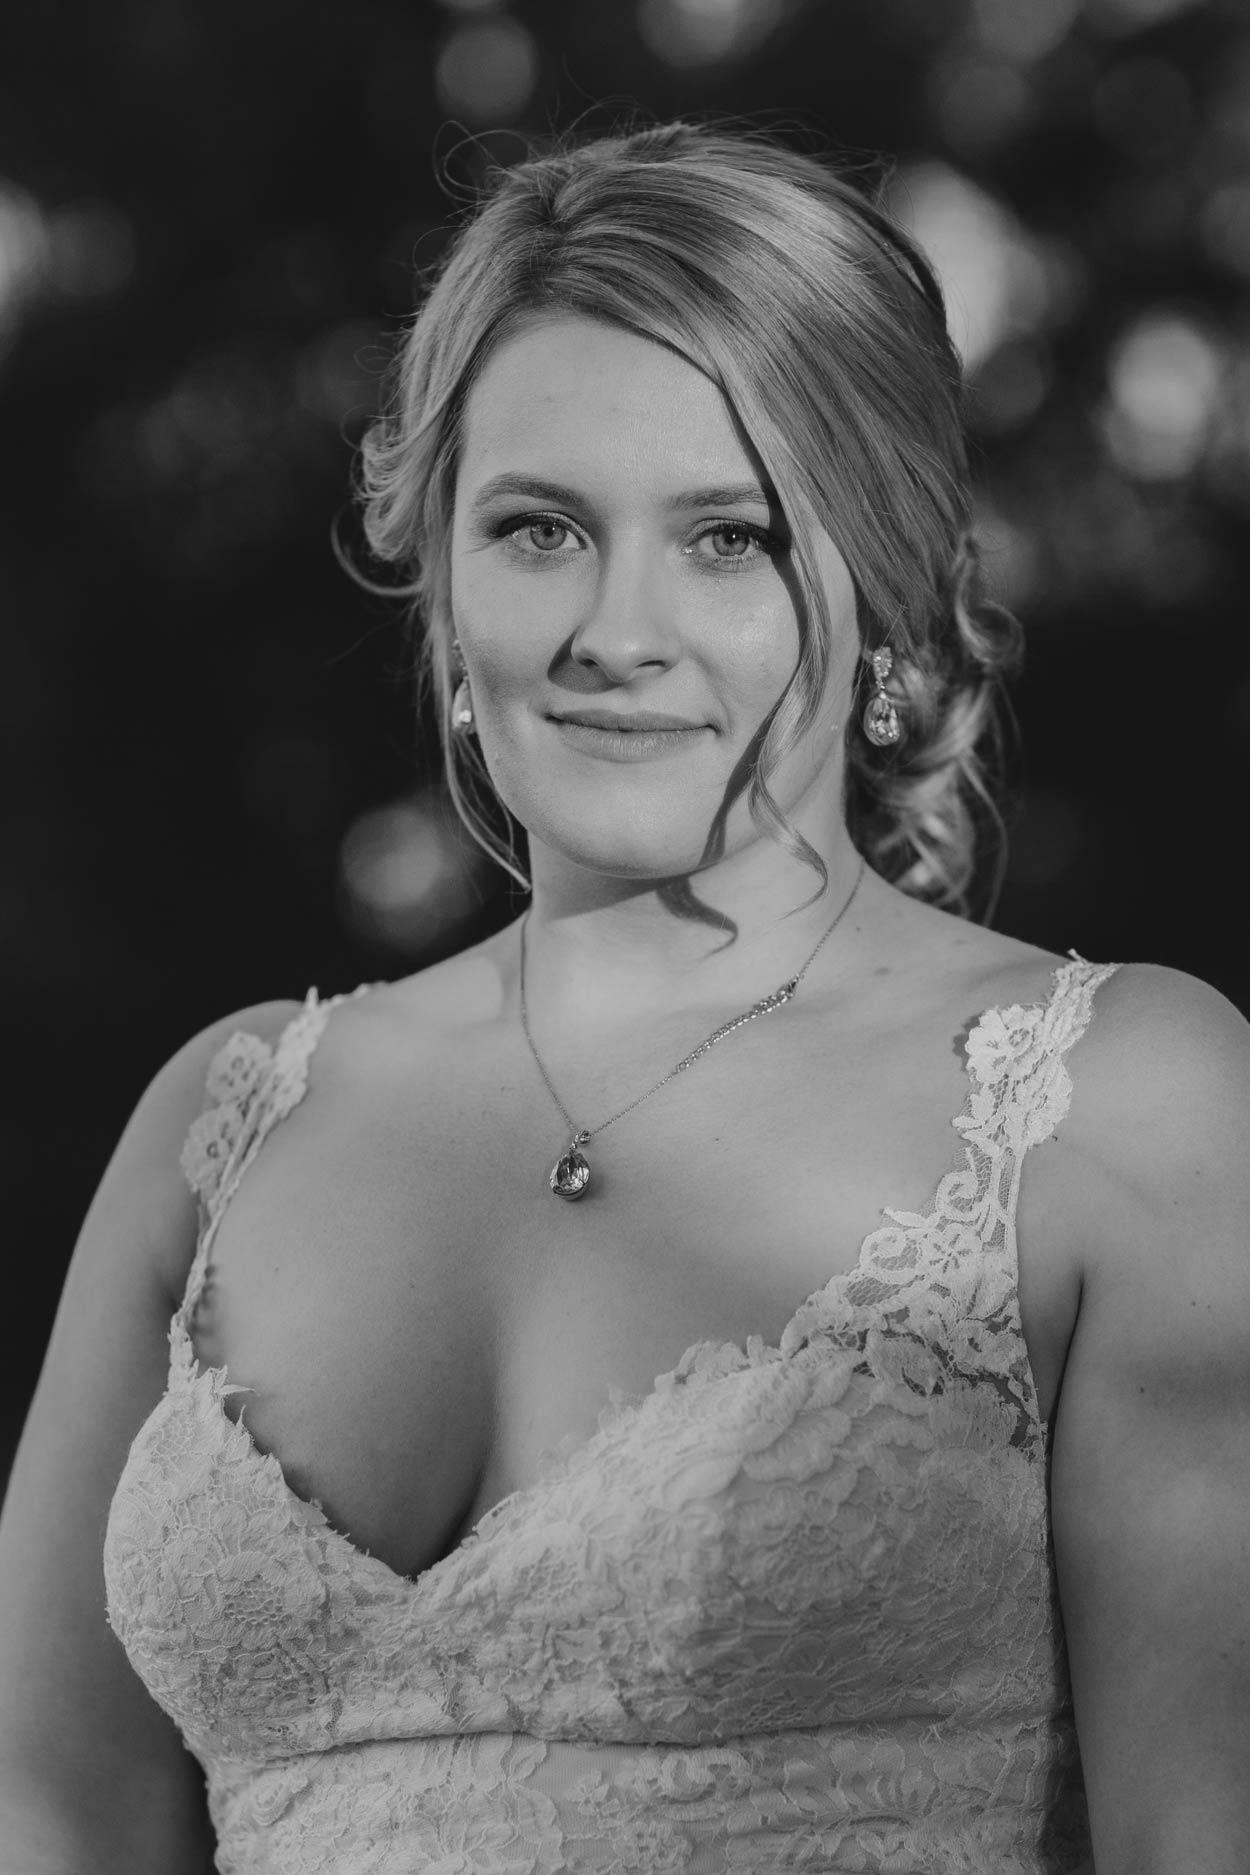 Noosa Heads Destination Beach Wedding Photographers - Sunshine Coast, Queensland, Australian Elopement